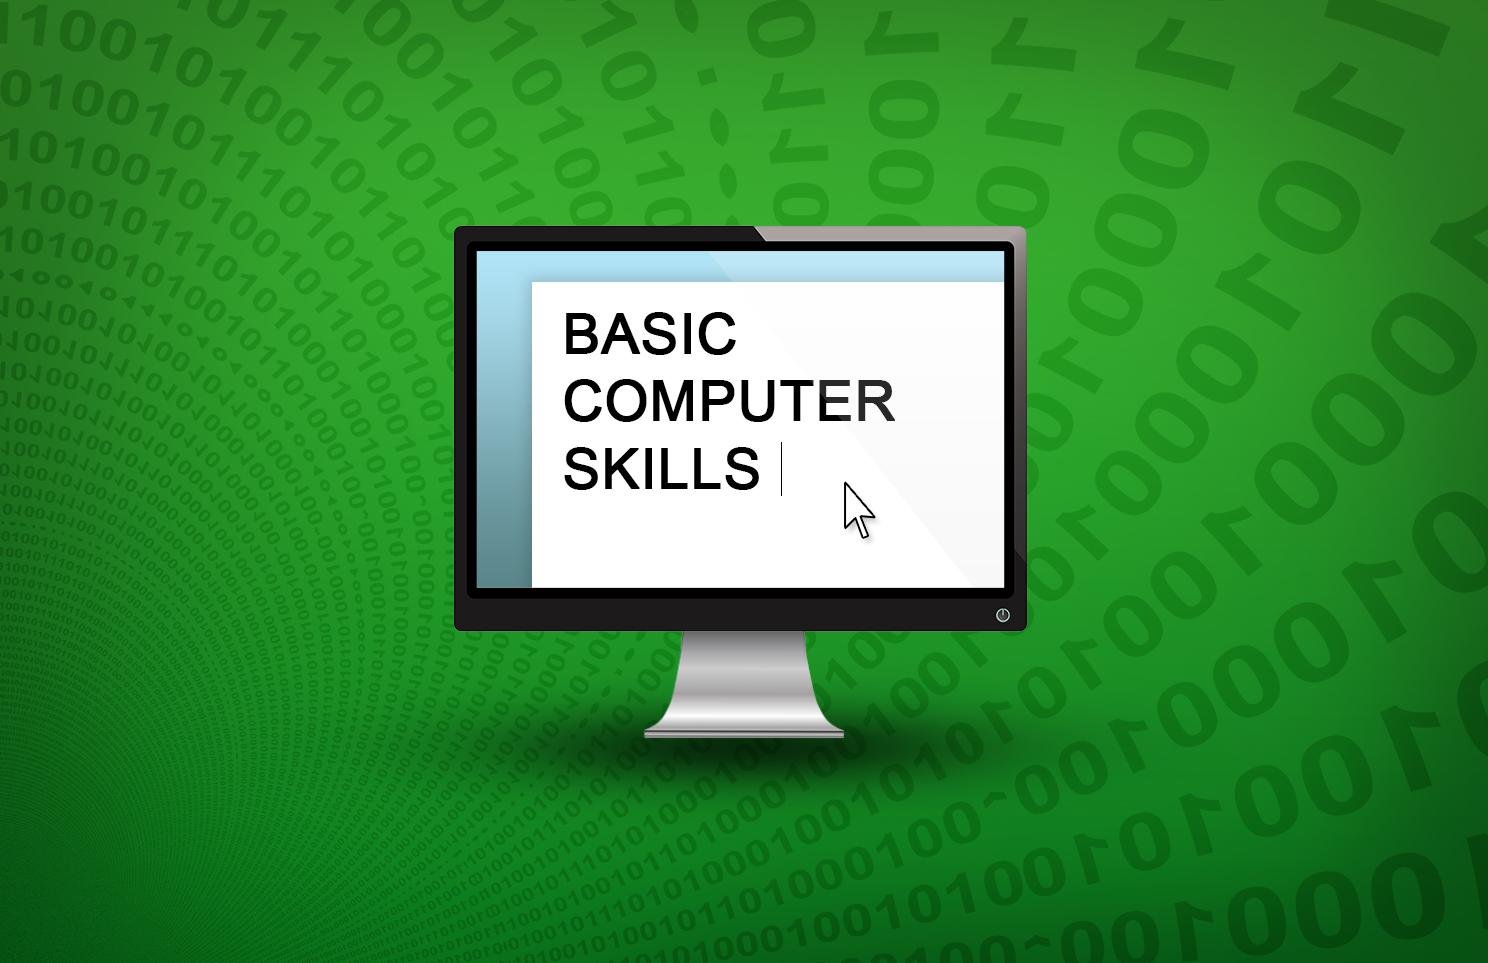 Basic Computer Skills.jpg